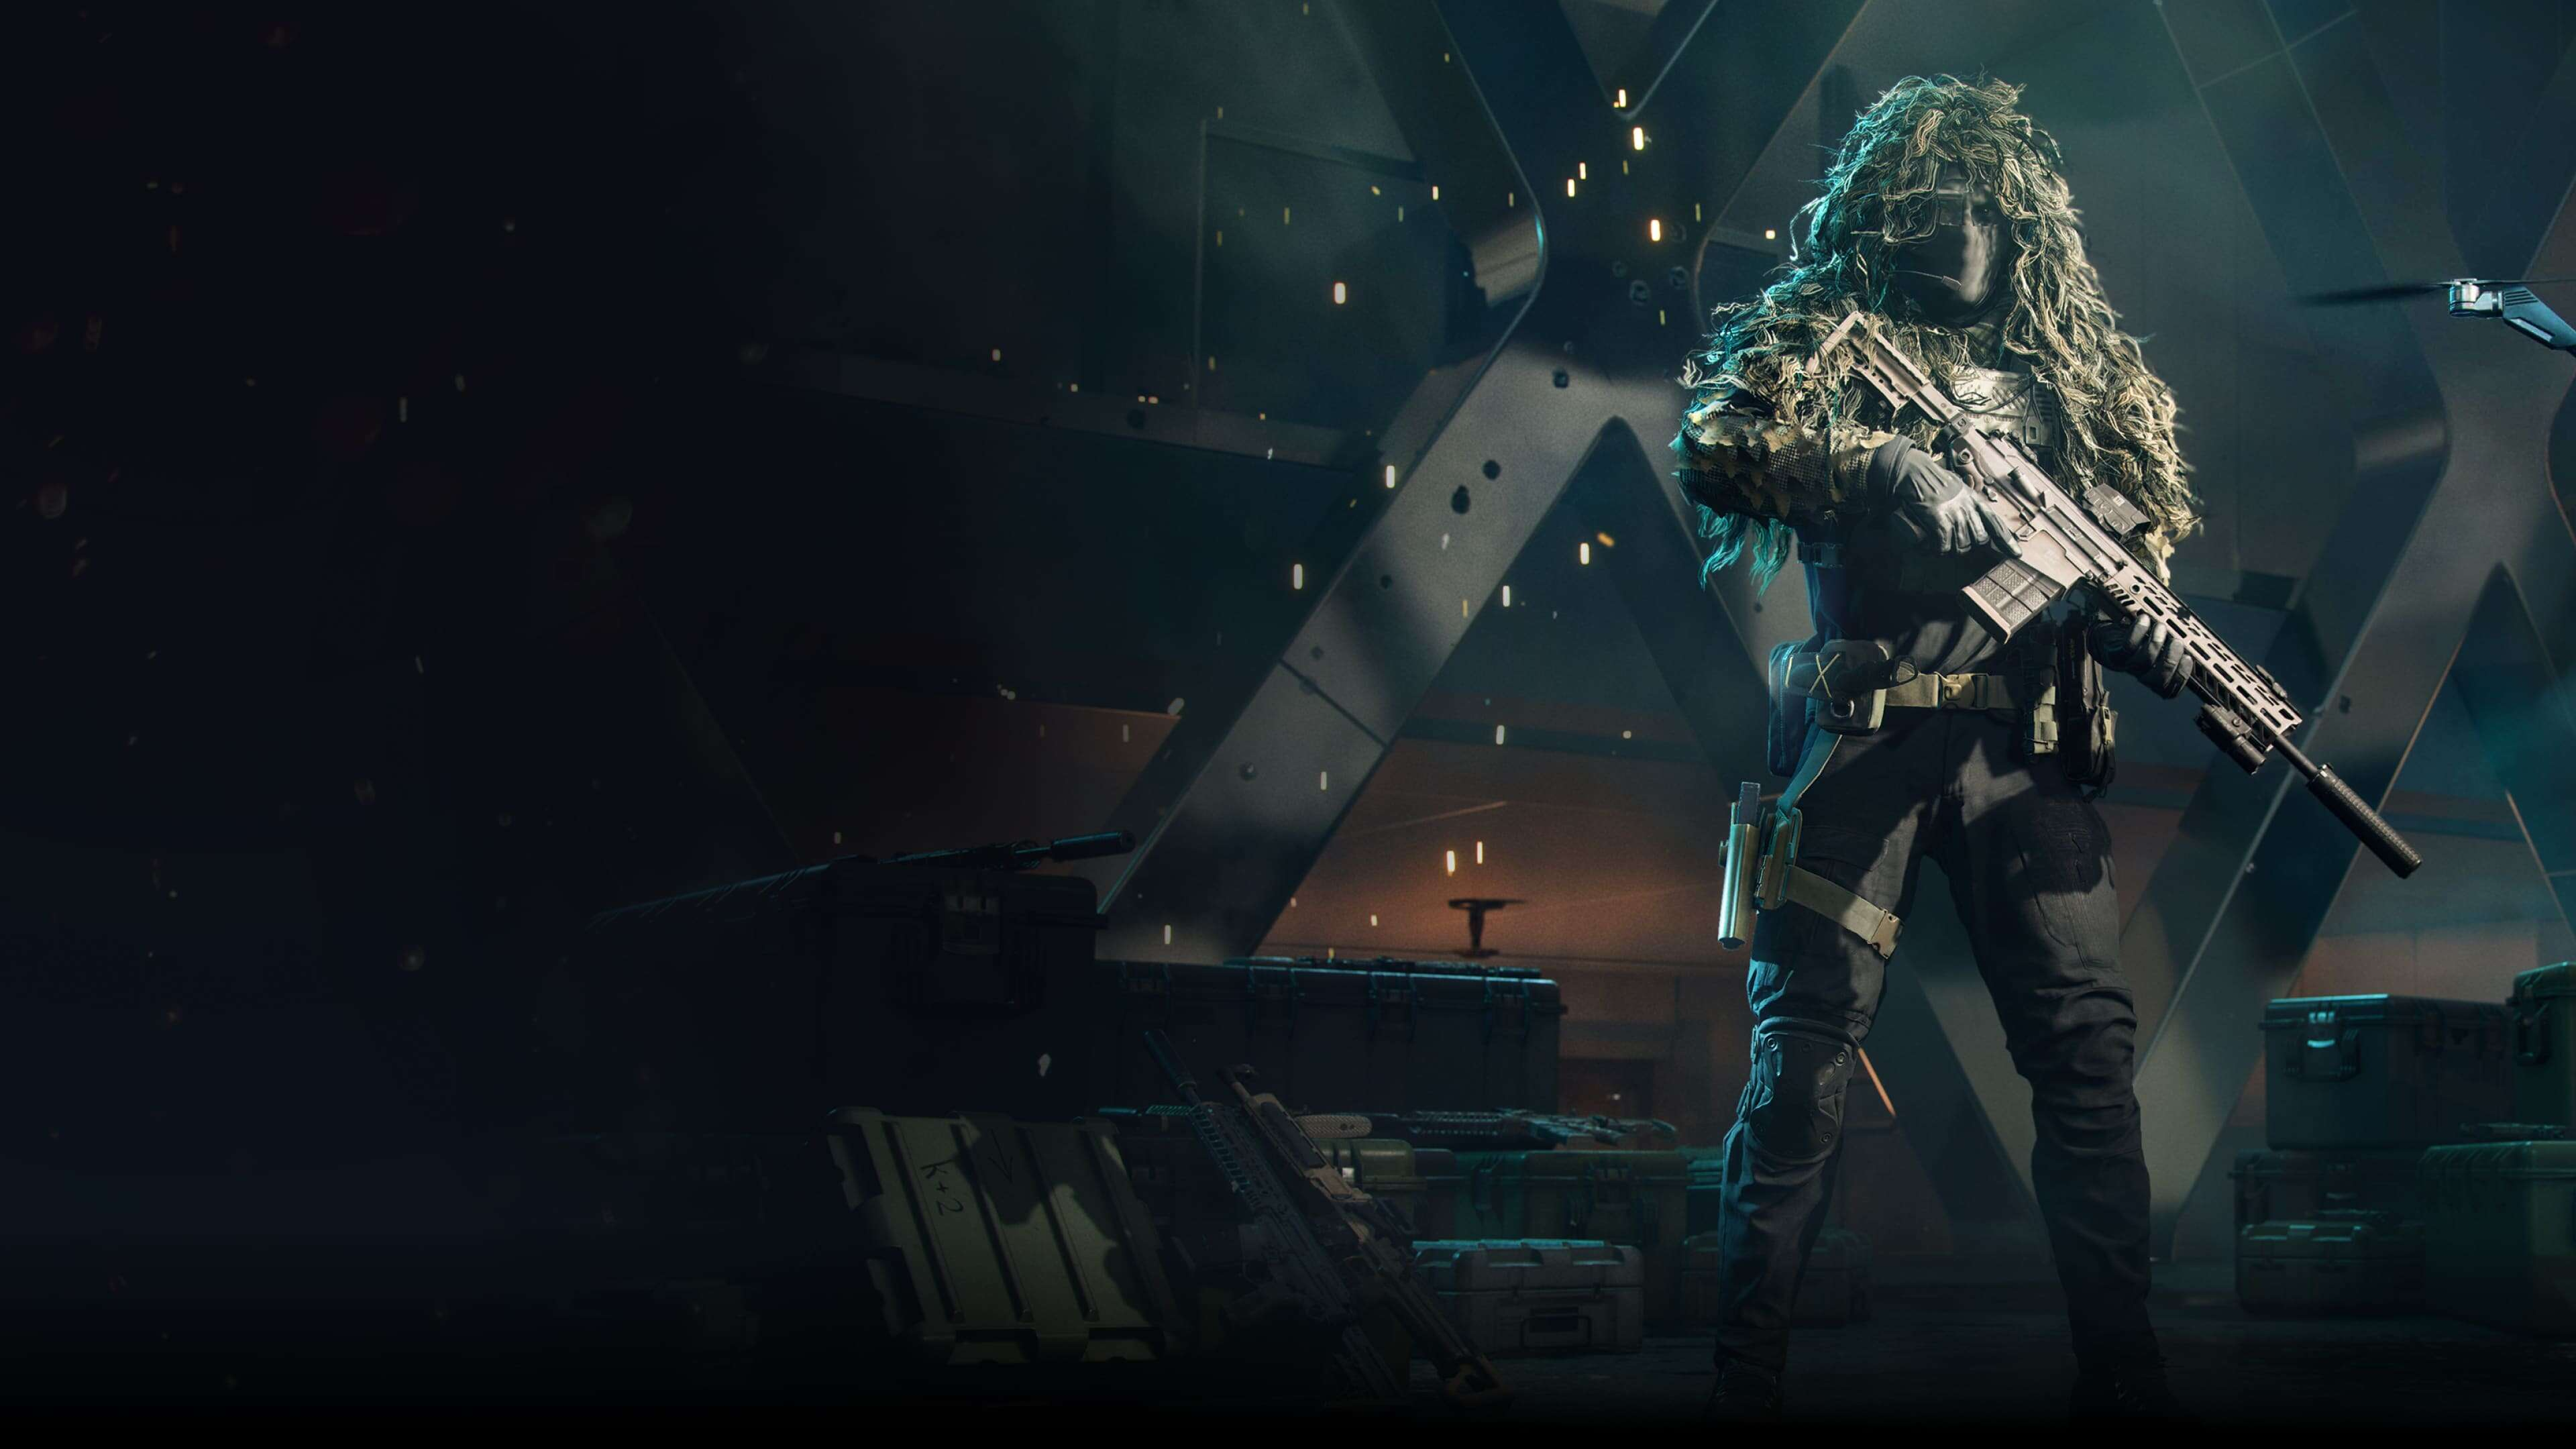 Викус Ван Дейл - Battlefield 2042